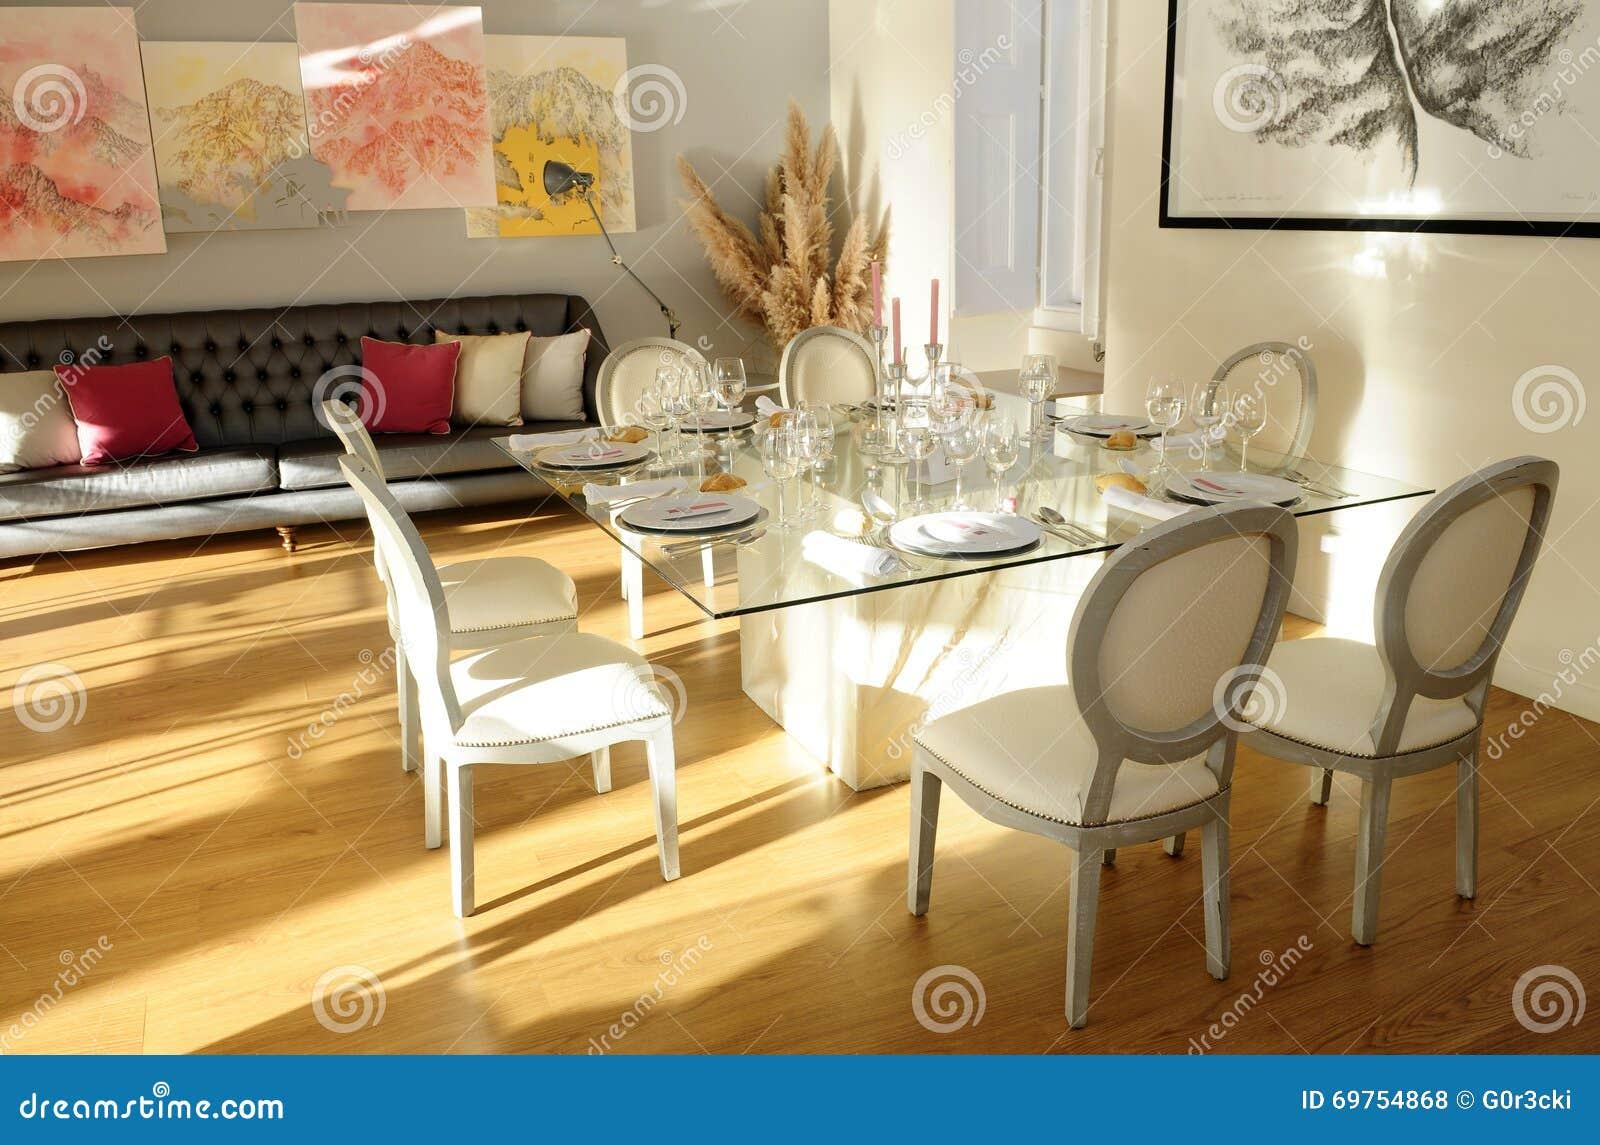 Table Setting Romantic Light And Decoration Elegant